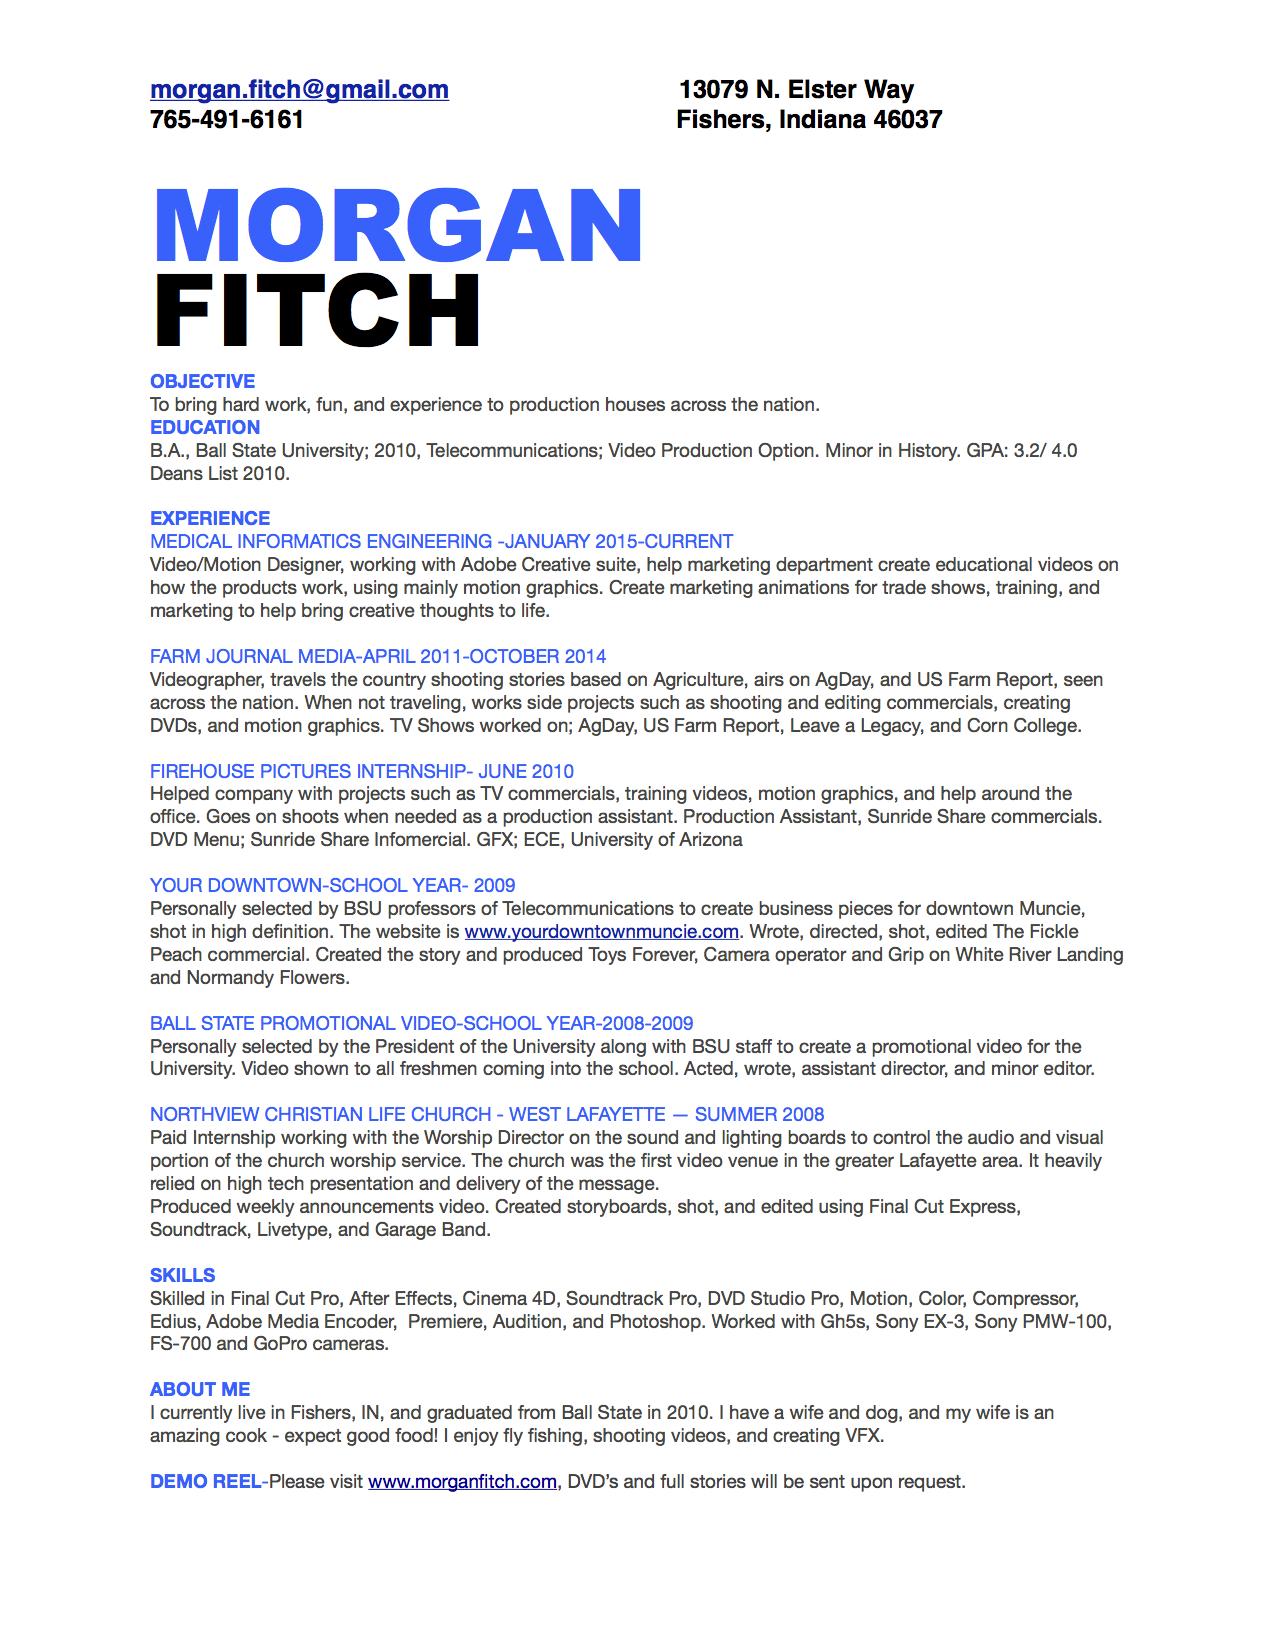 Morgan Fitch Resume .jpg